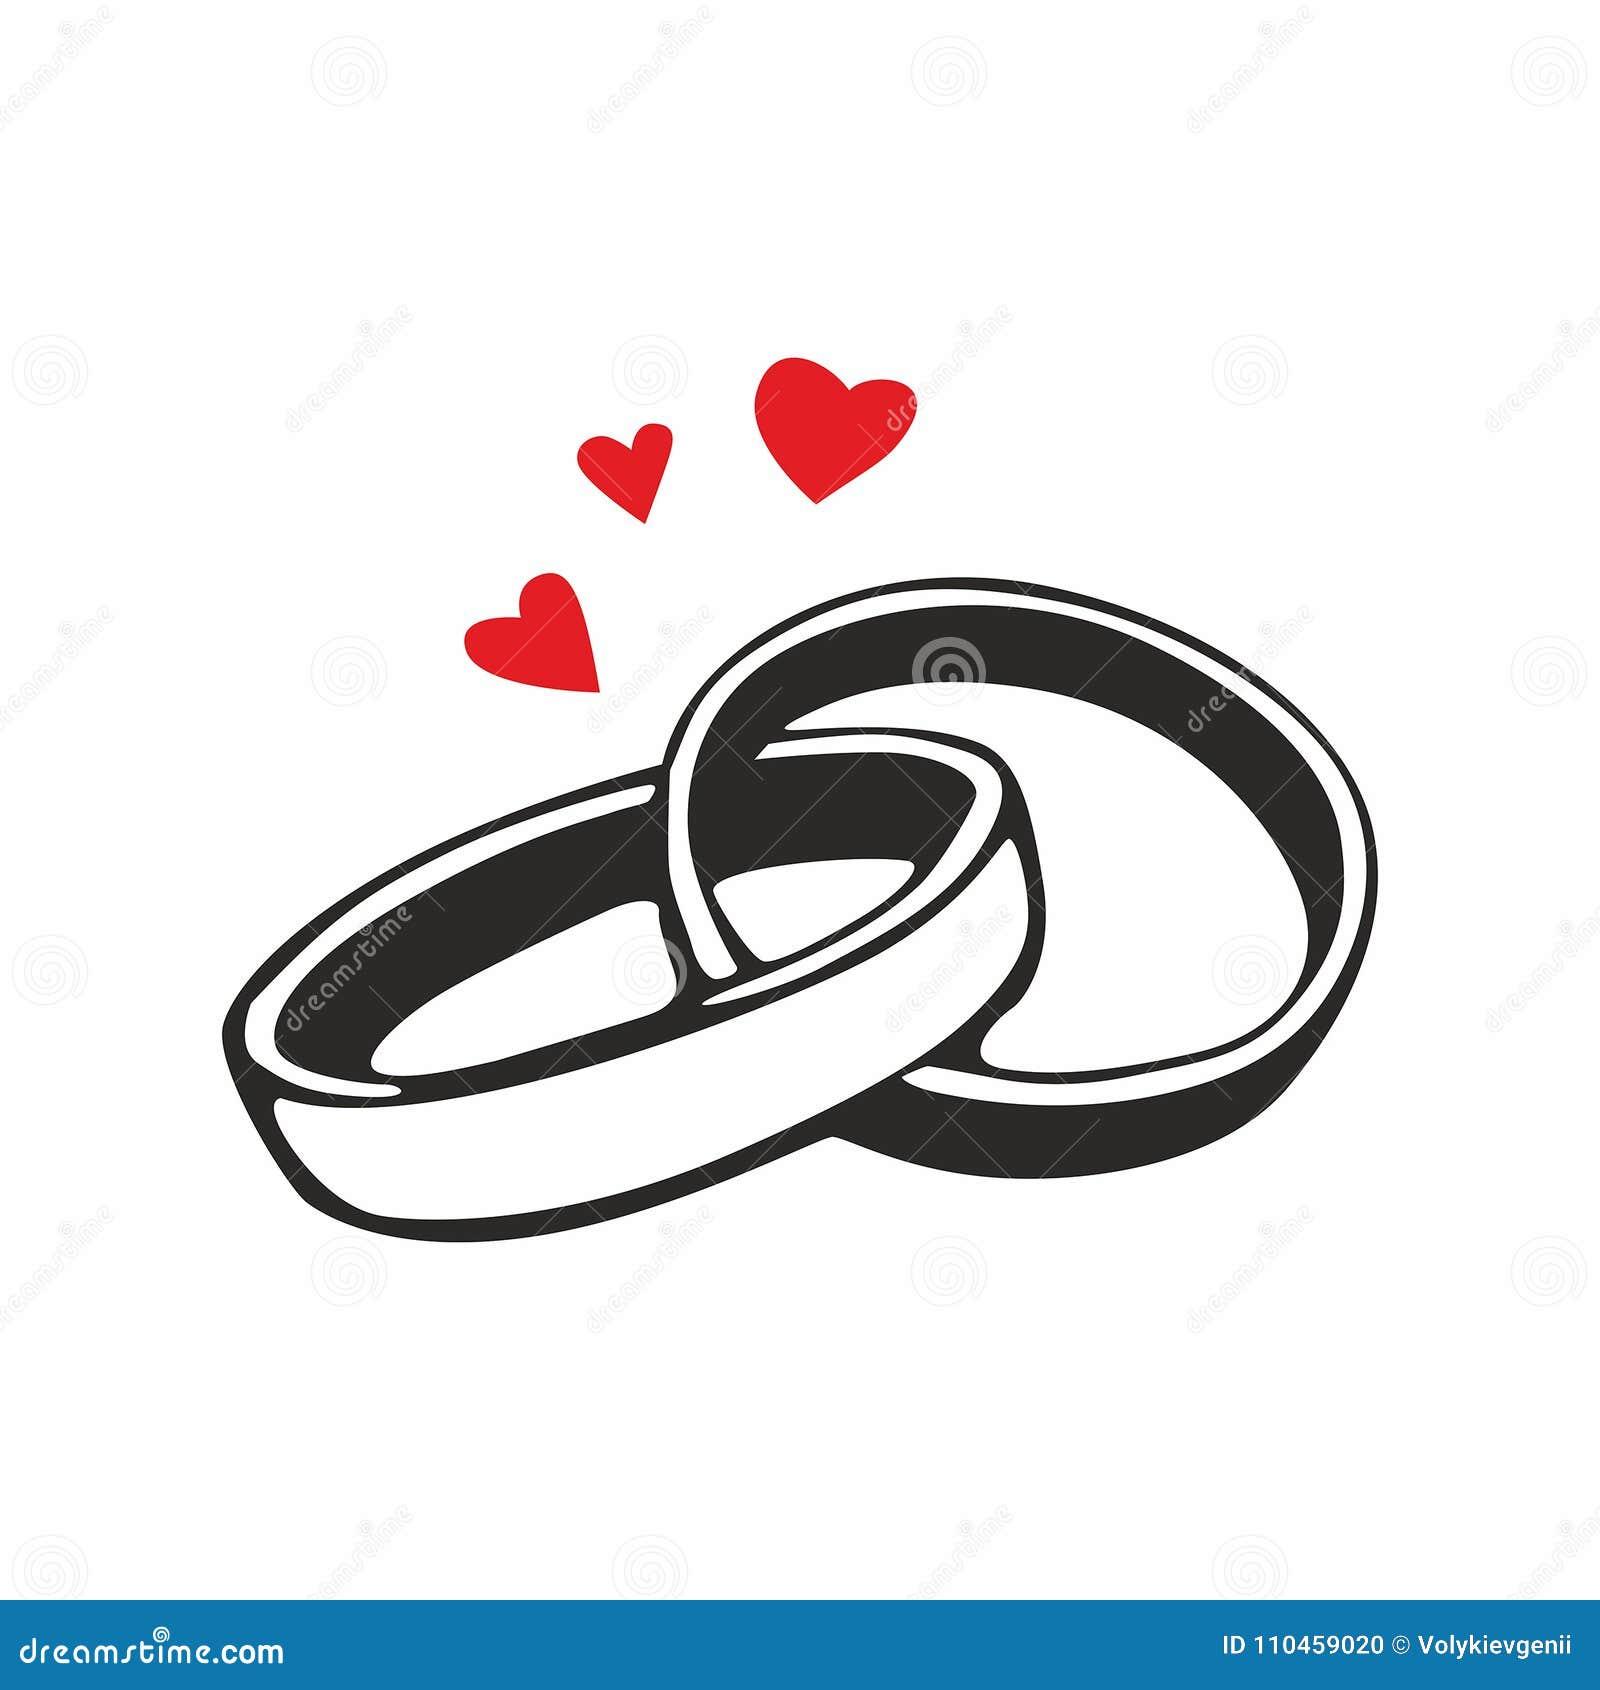 wedding ring drawing stock illustrations – 5,010 wedding ring drawing stock  illustrations, vectors & clipart - dreamstime  dreamstime.com